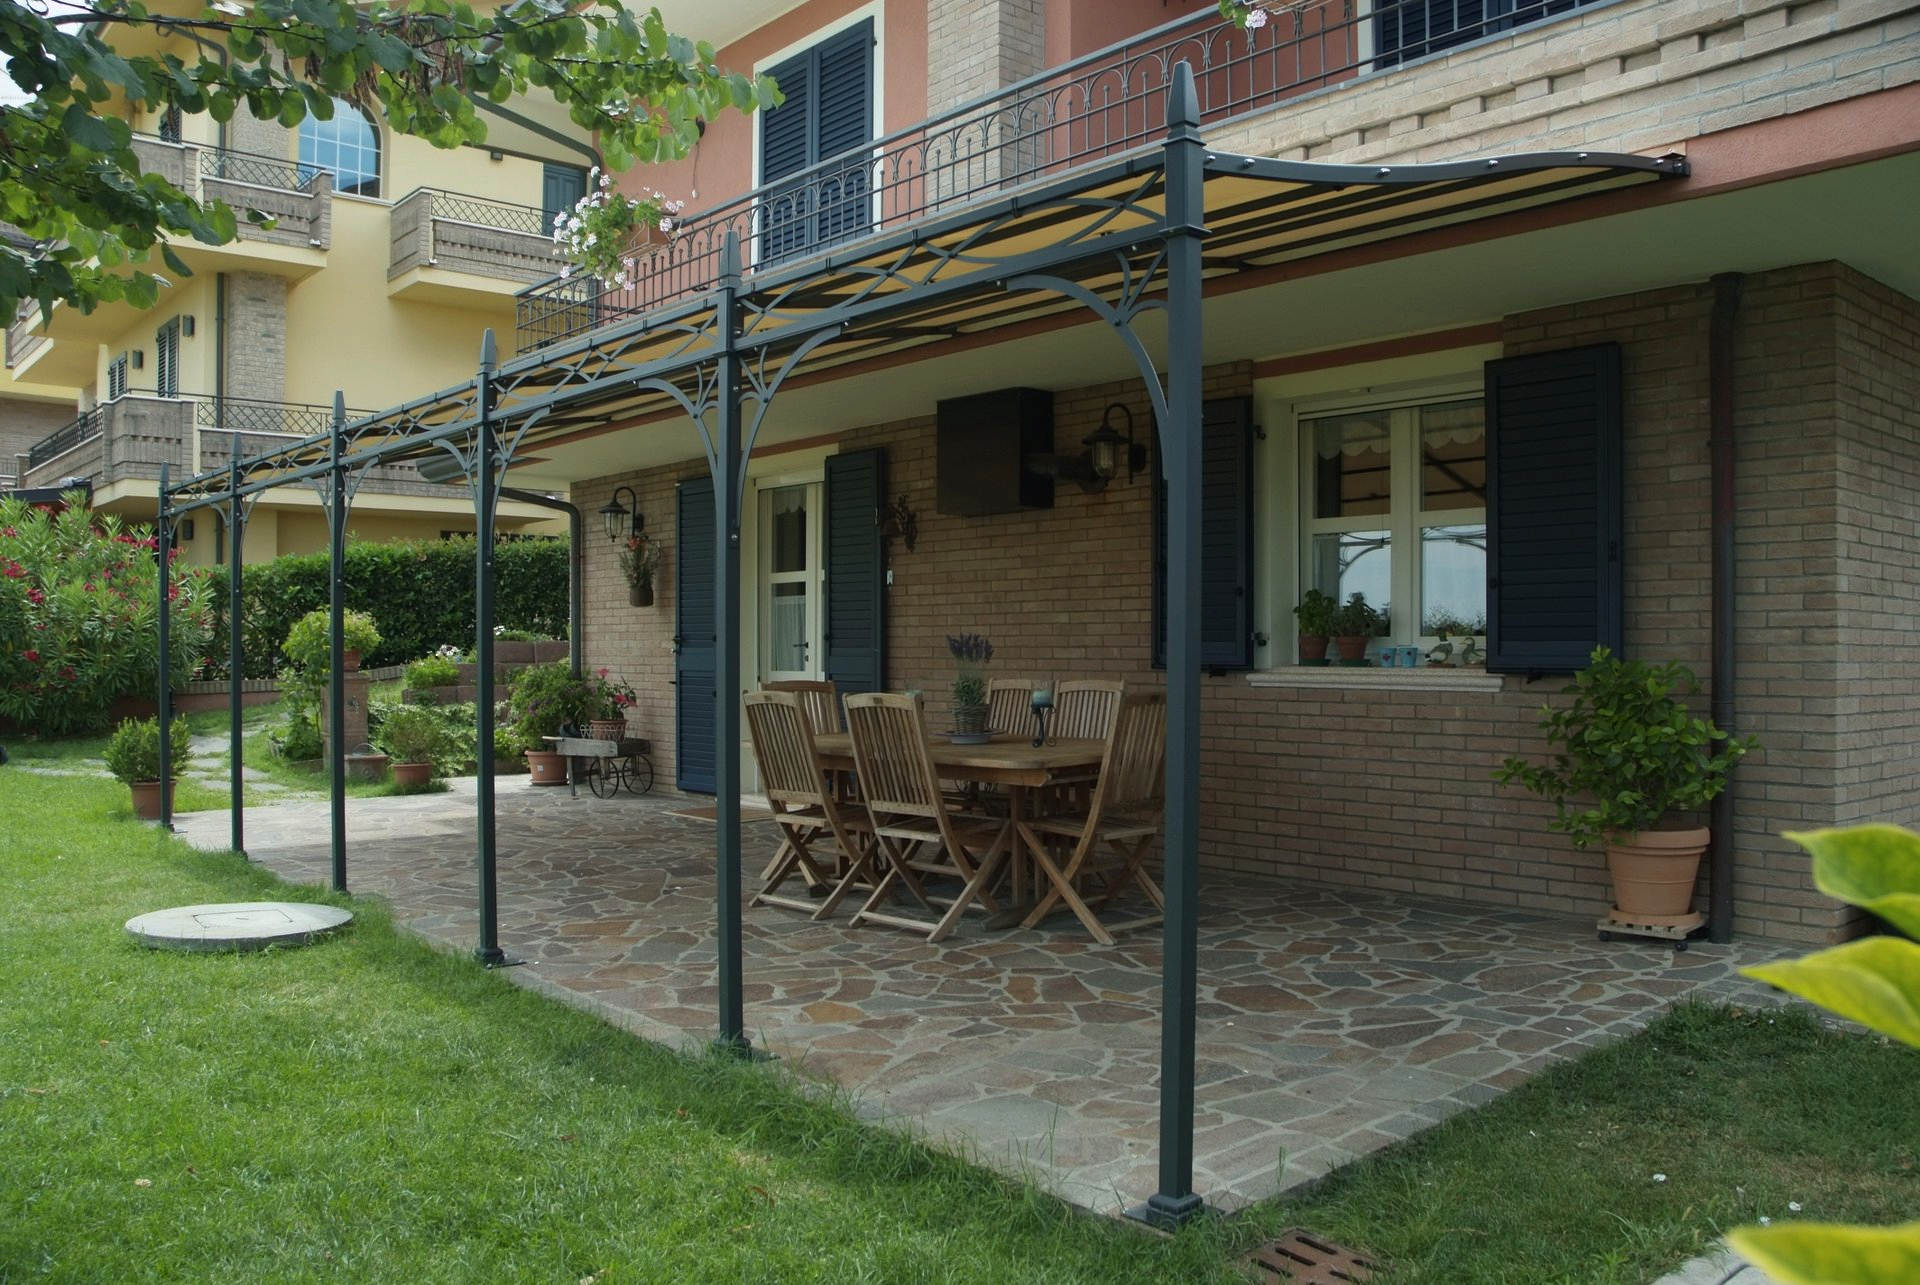 Pergola novecento in ferro forgiato zincatura a caldo dcoperture - Pergola giardino ...